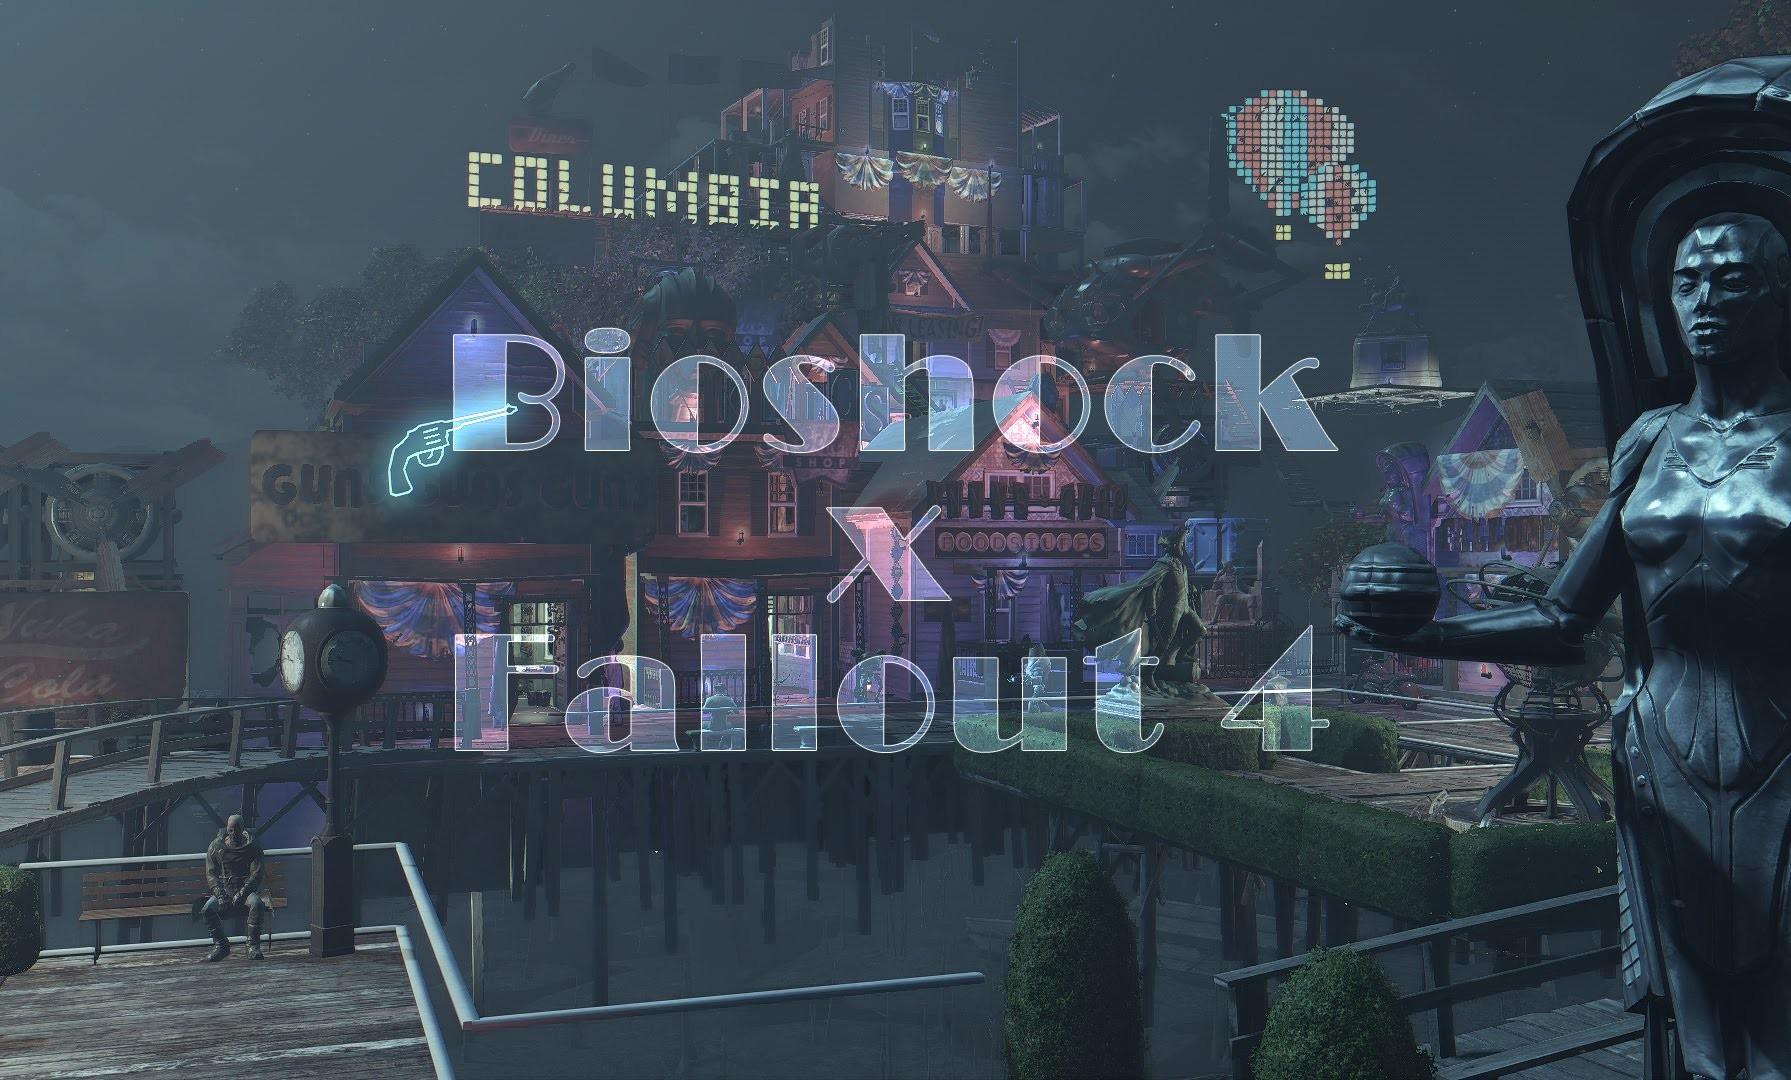 FALLOUT 4: BIOSHOCK INFINITE